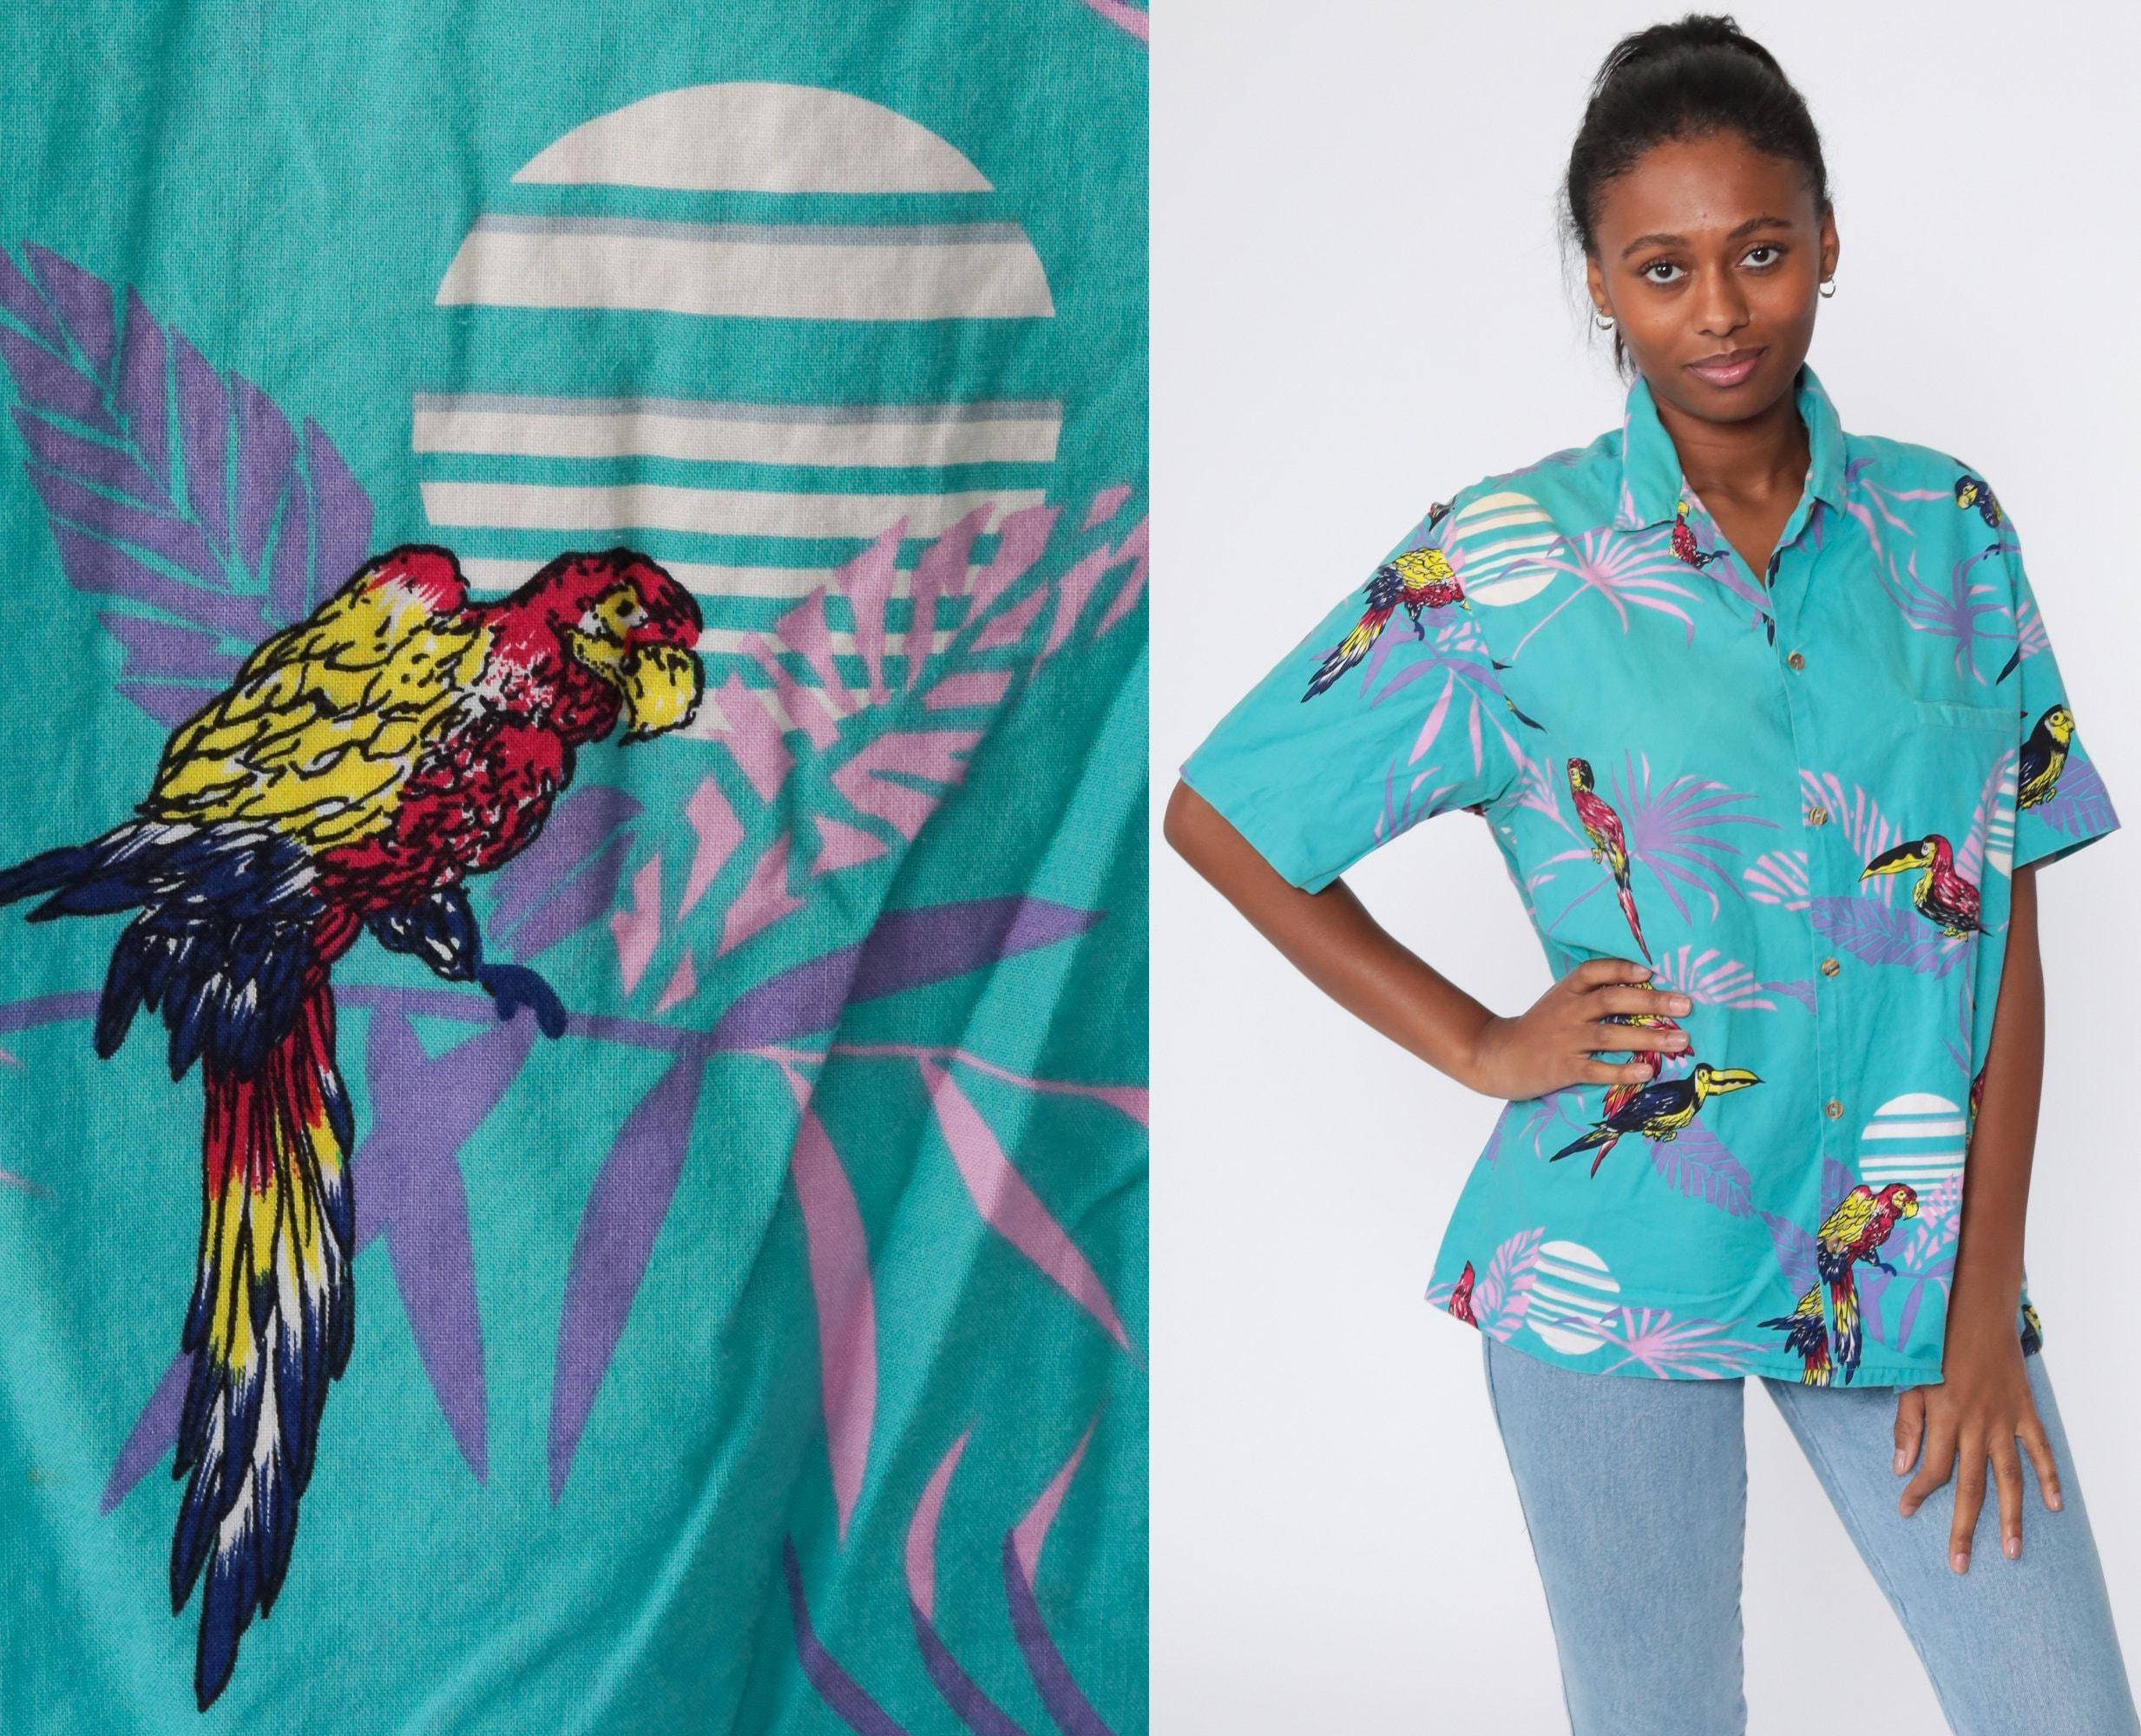 1970s Men's Shirt Styles – Vintage 70s Shirts for Guys Bird Shirt Tropical Surfer Parrot Print 70S Hawaiian Blouse Palm Tree Top Button Up Short Sleeve Beach 1970S Extra Large Xl L $39.00 AT vintagedancer.com